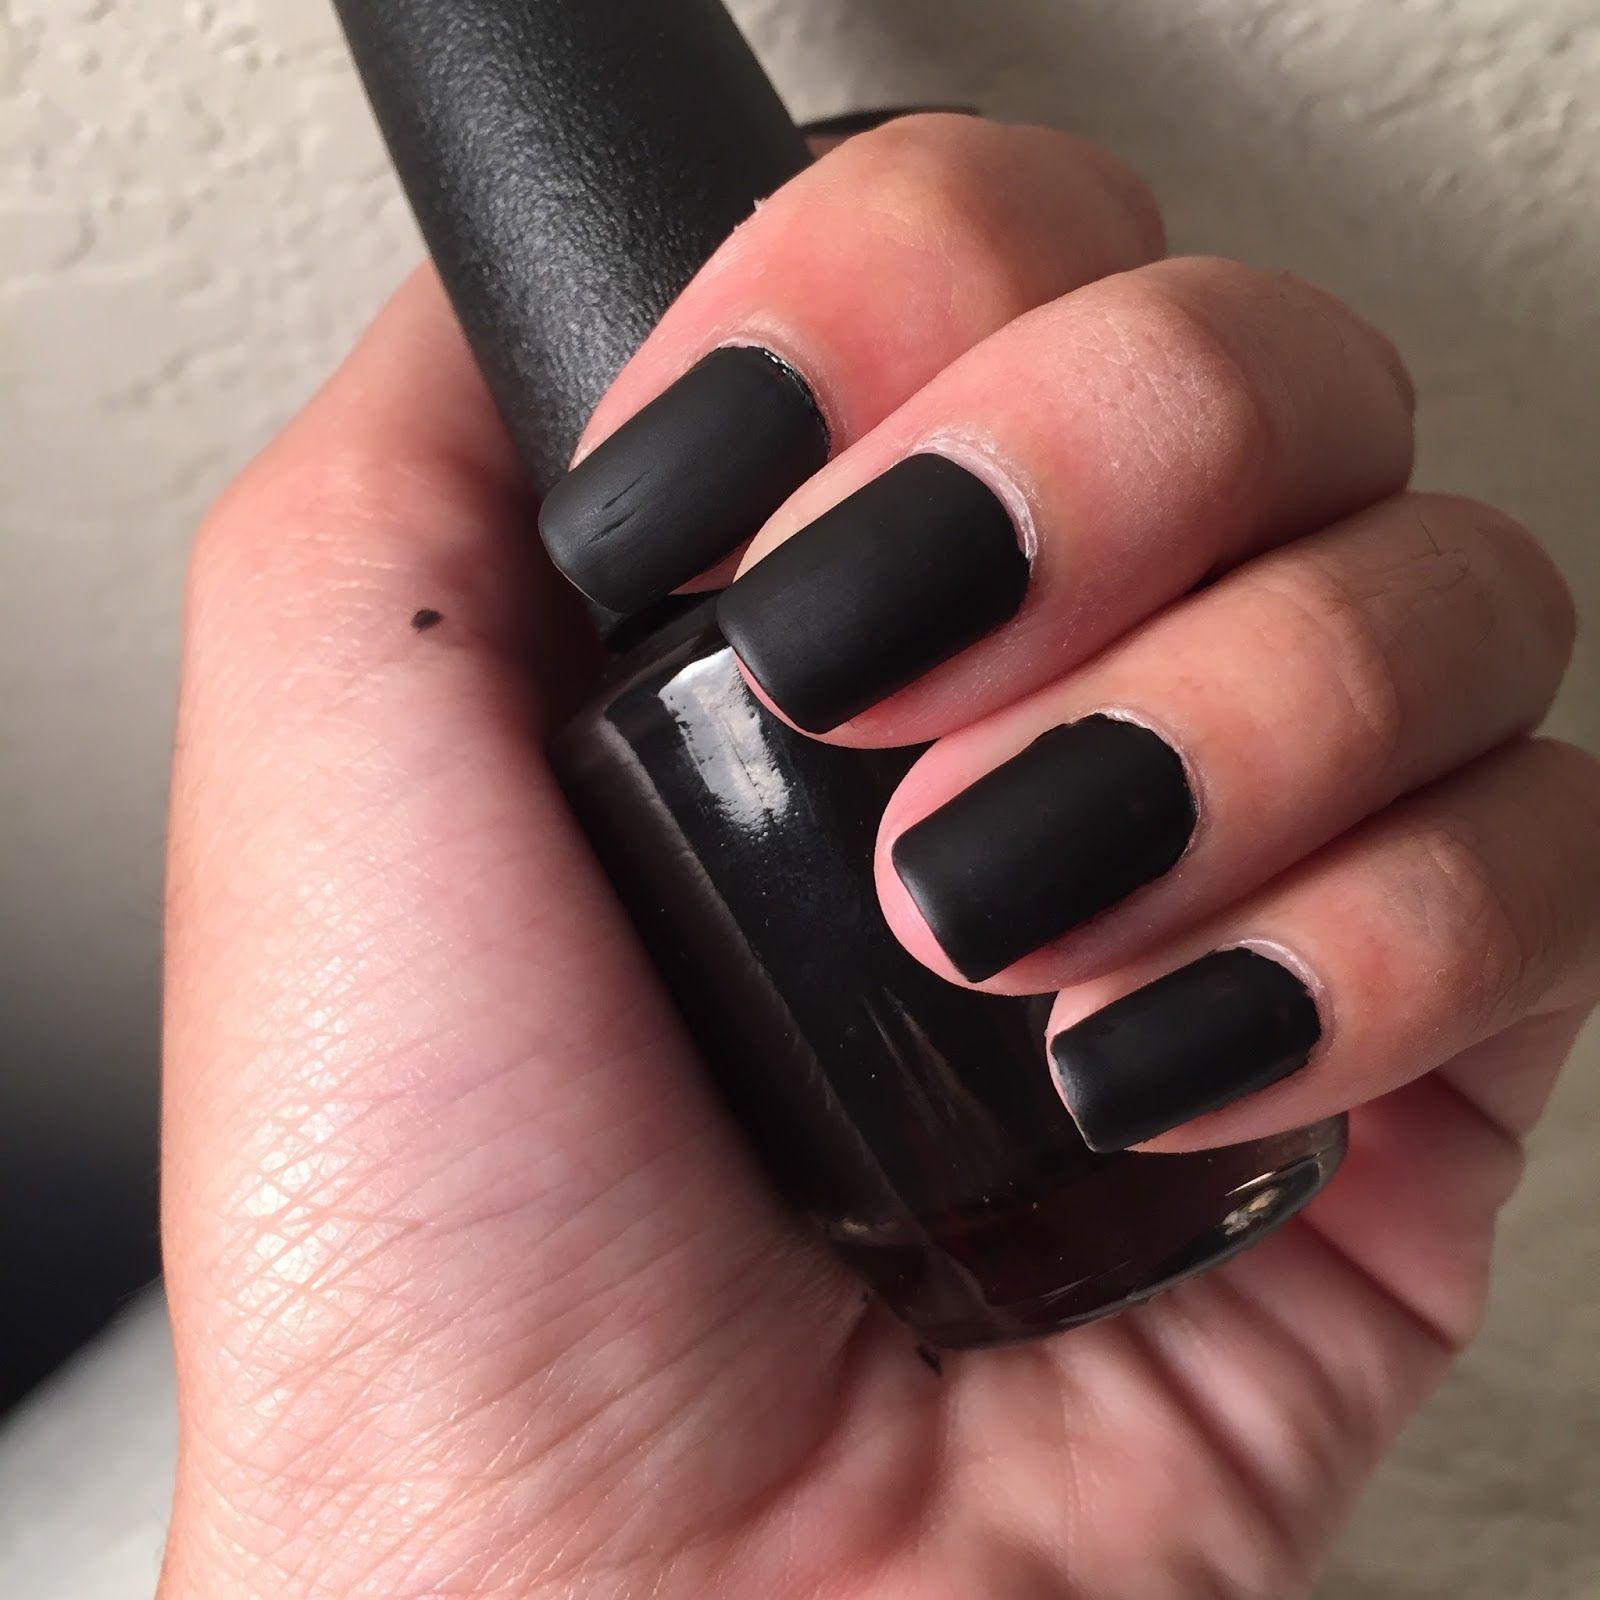 Matte Black Nail Polish   Thavy Time   { Beauty }   Pinterest ...